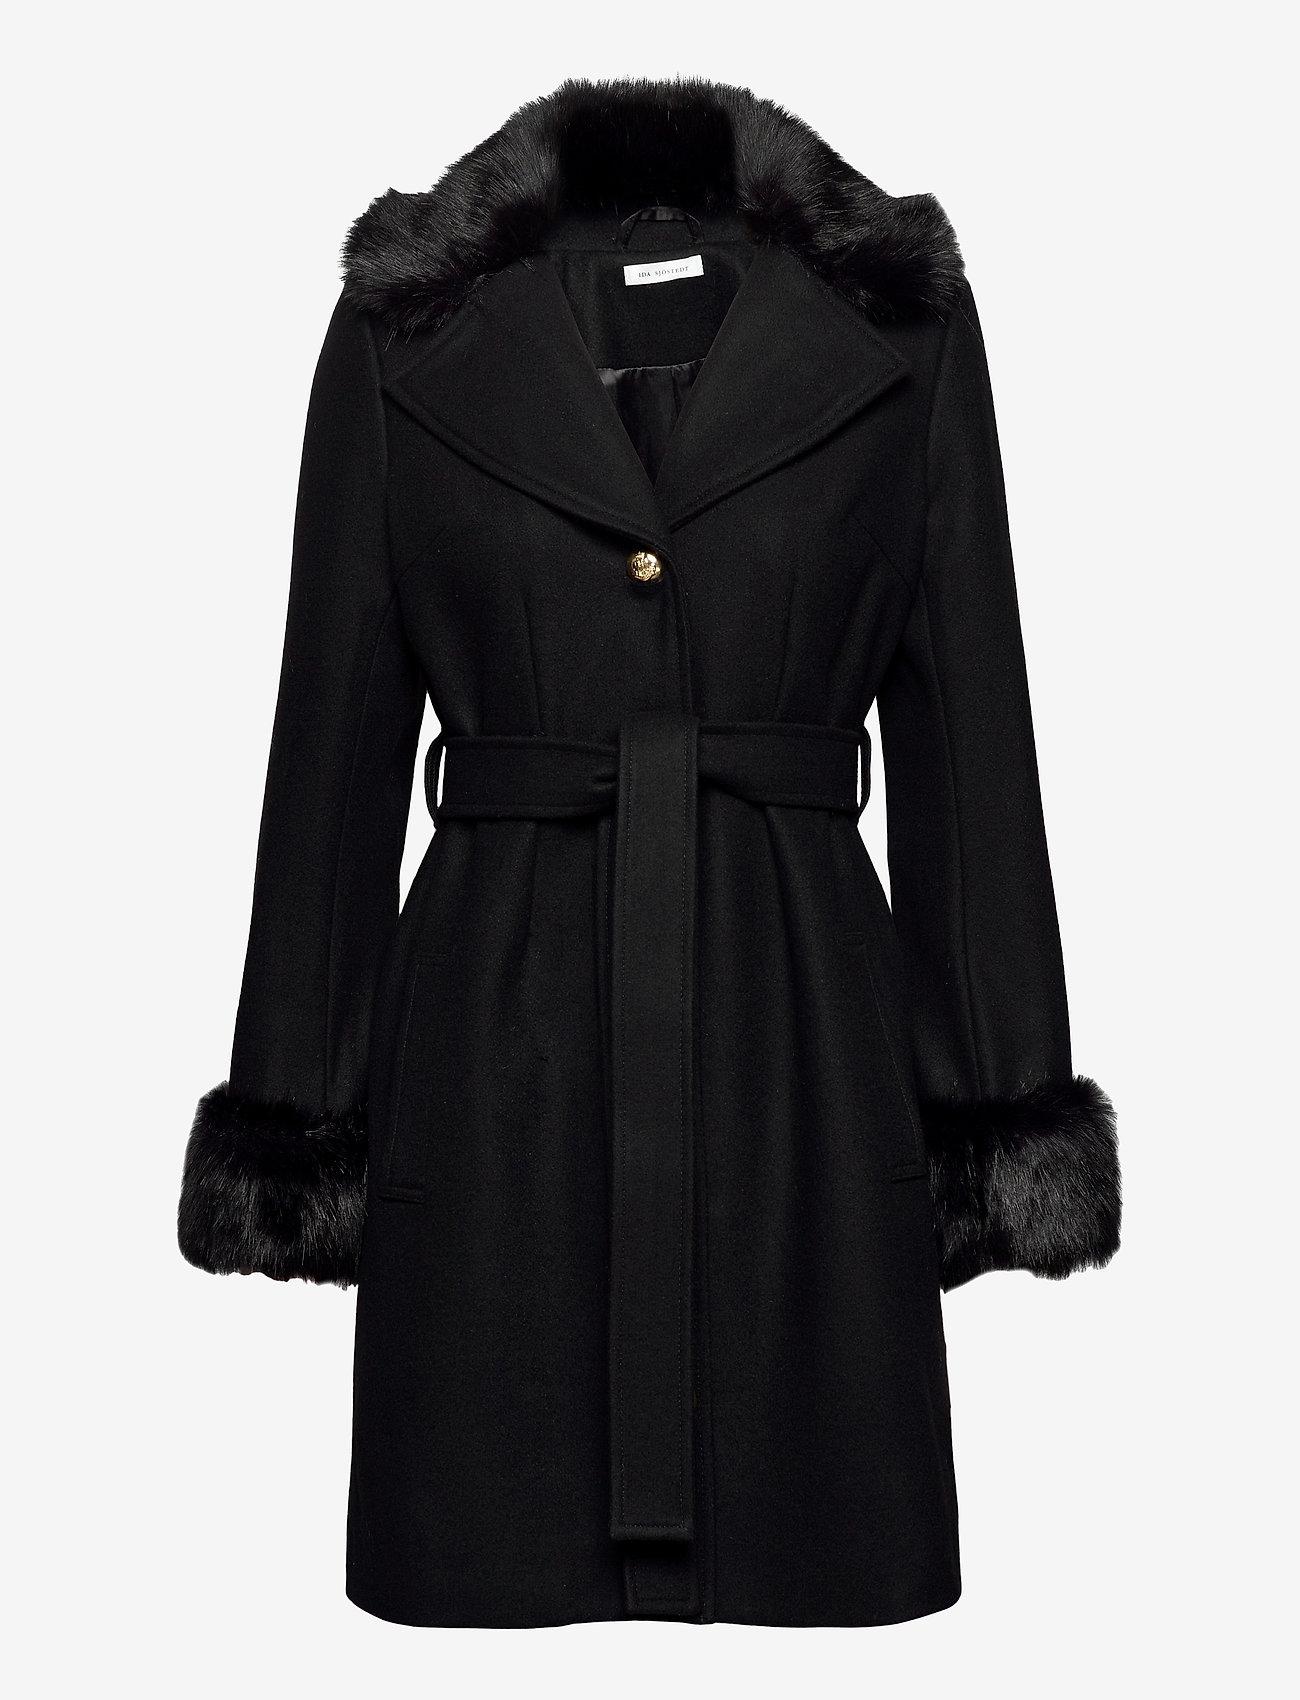 Köp Ida Sjöstedt Zoey Coat Black | Jackor